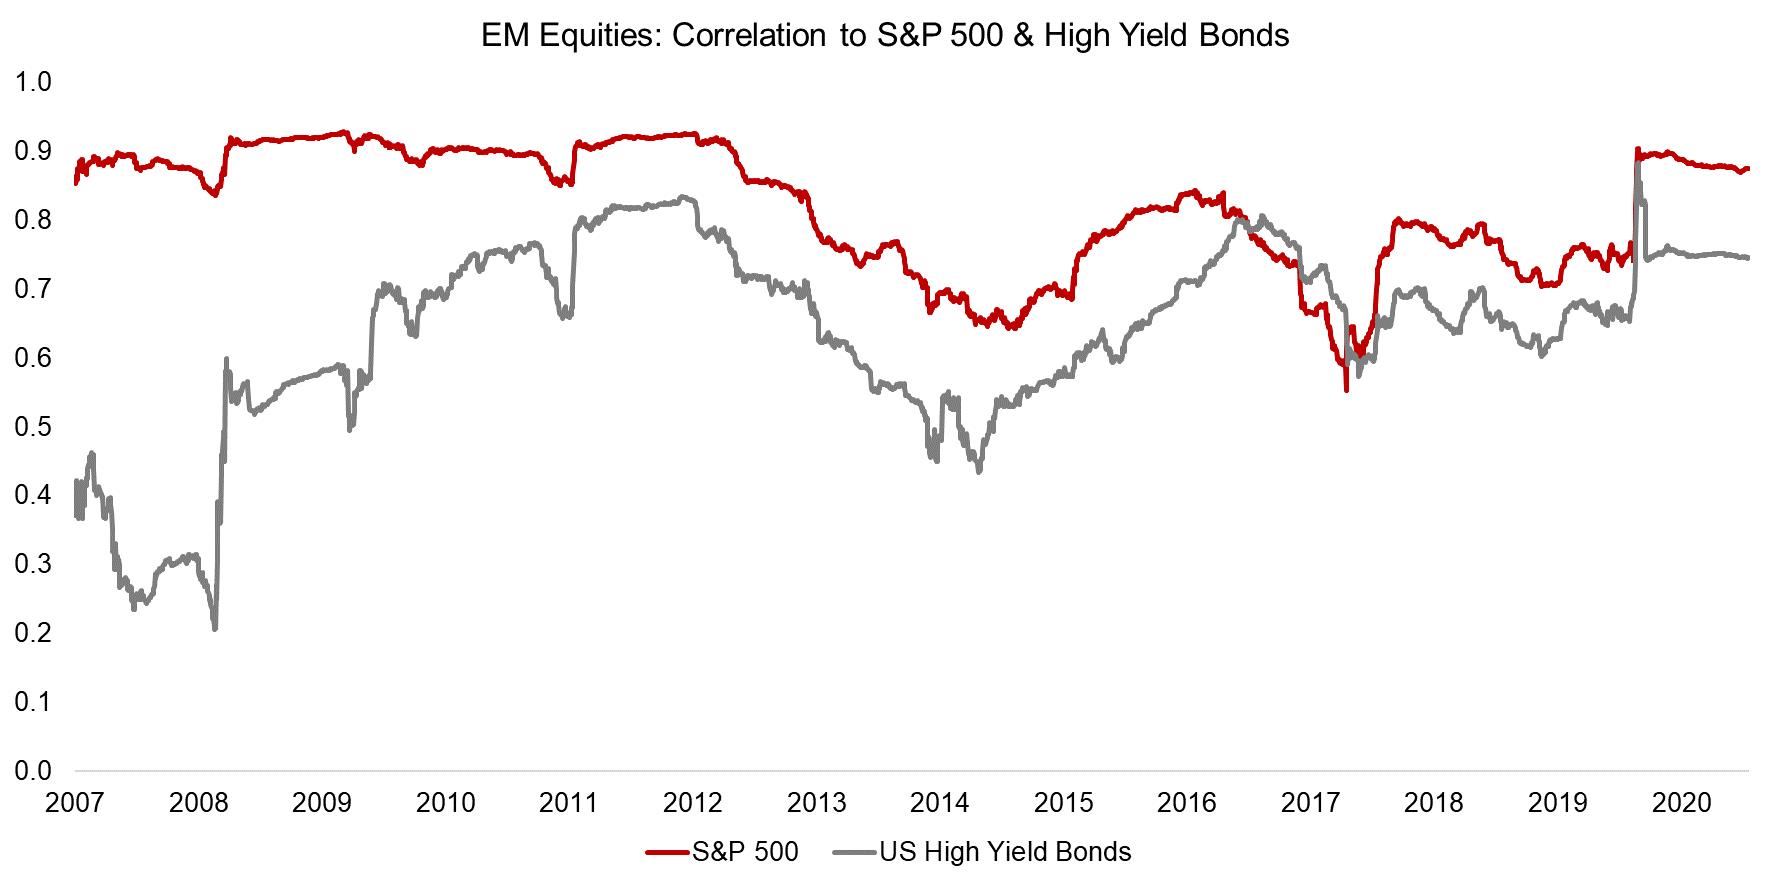 EM Equities Correlation to S&P 500 & High Yield Bonds